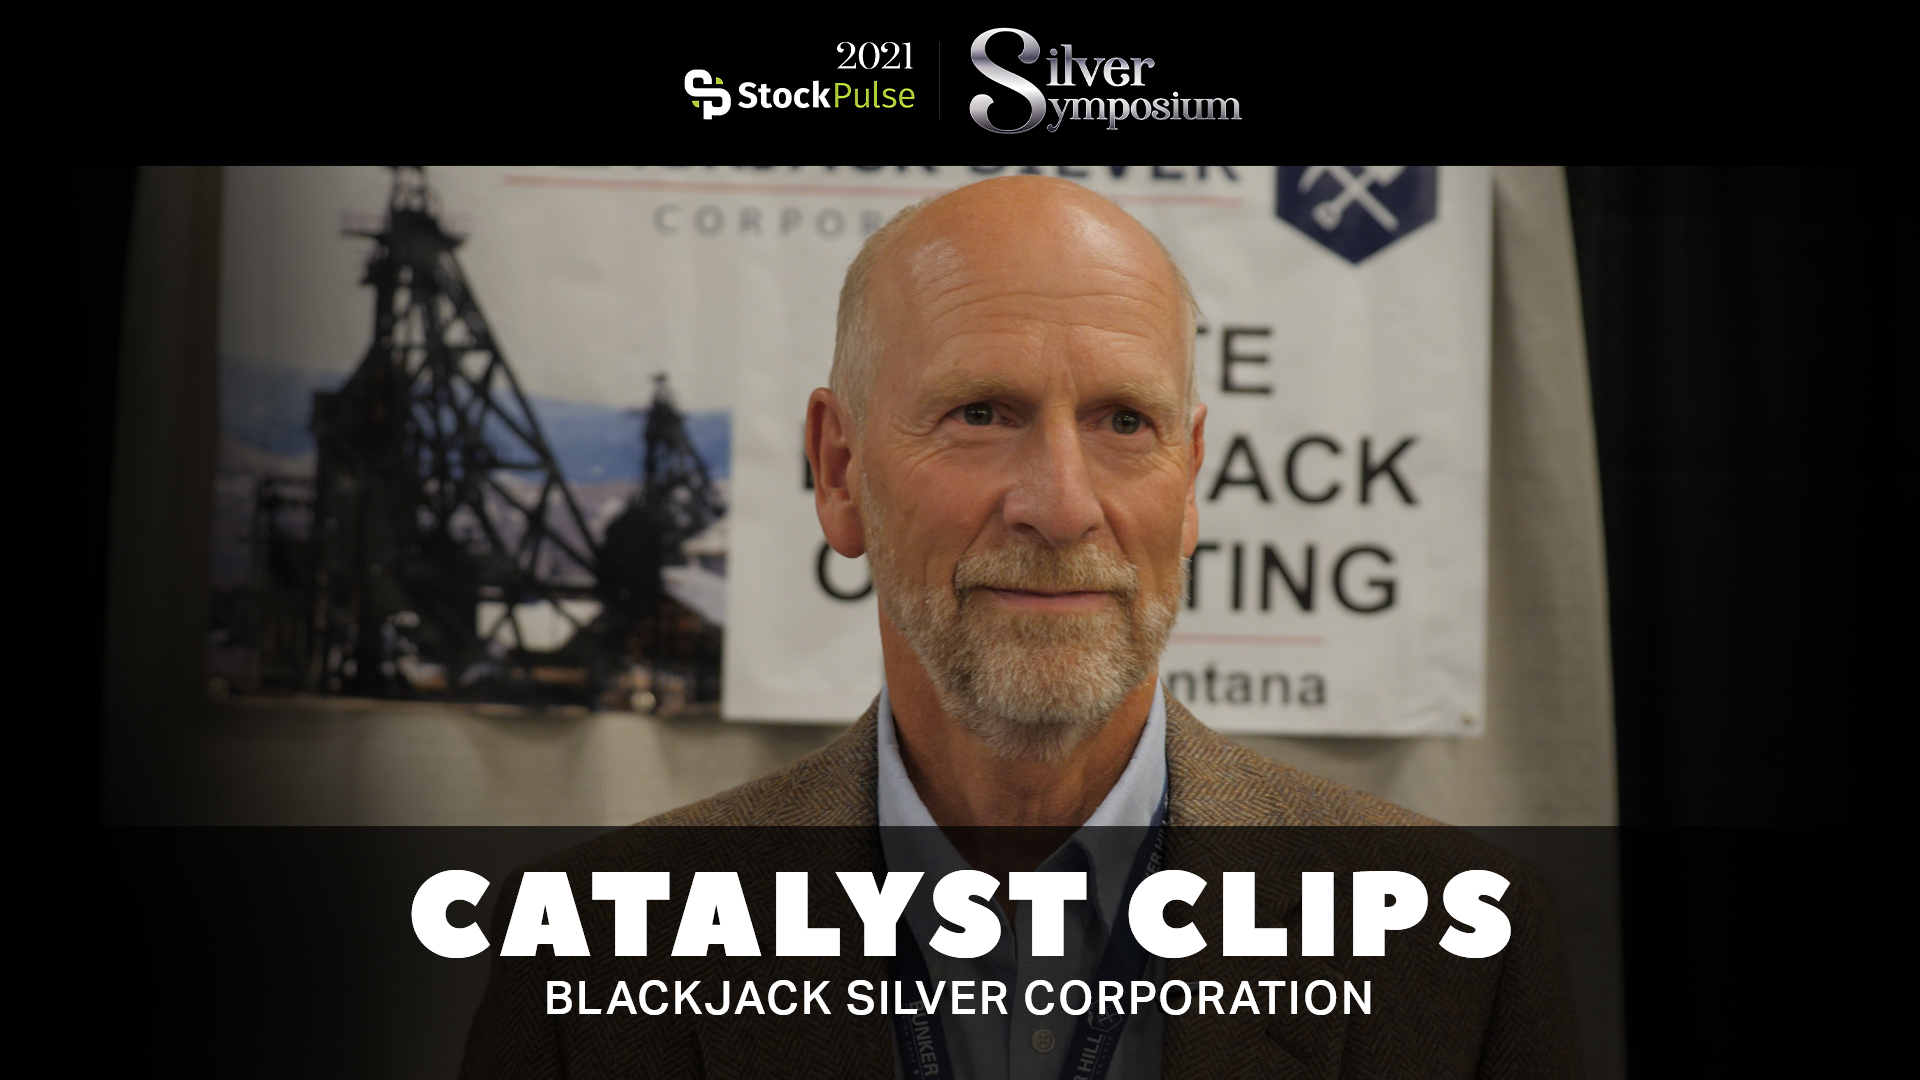 2021 StockPulse Silver Symposium Catalyst Clips | Mark Hartmann of Blackjack Silver Corporation